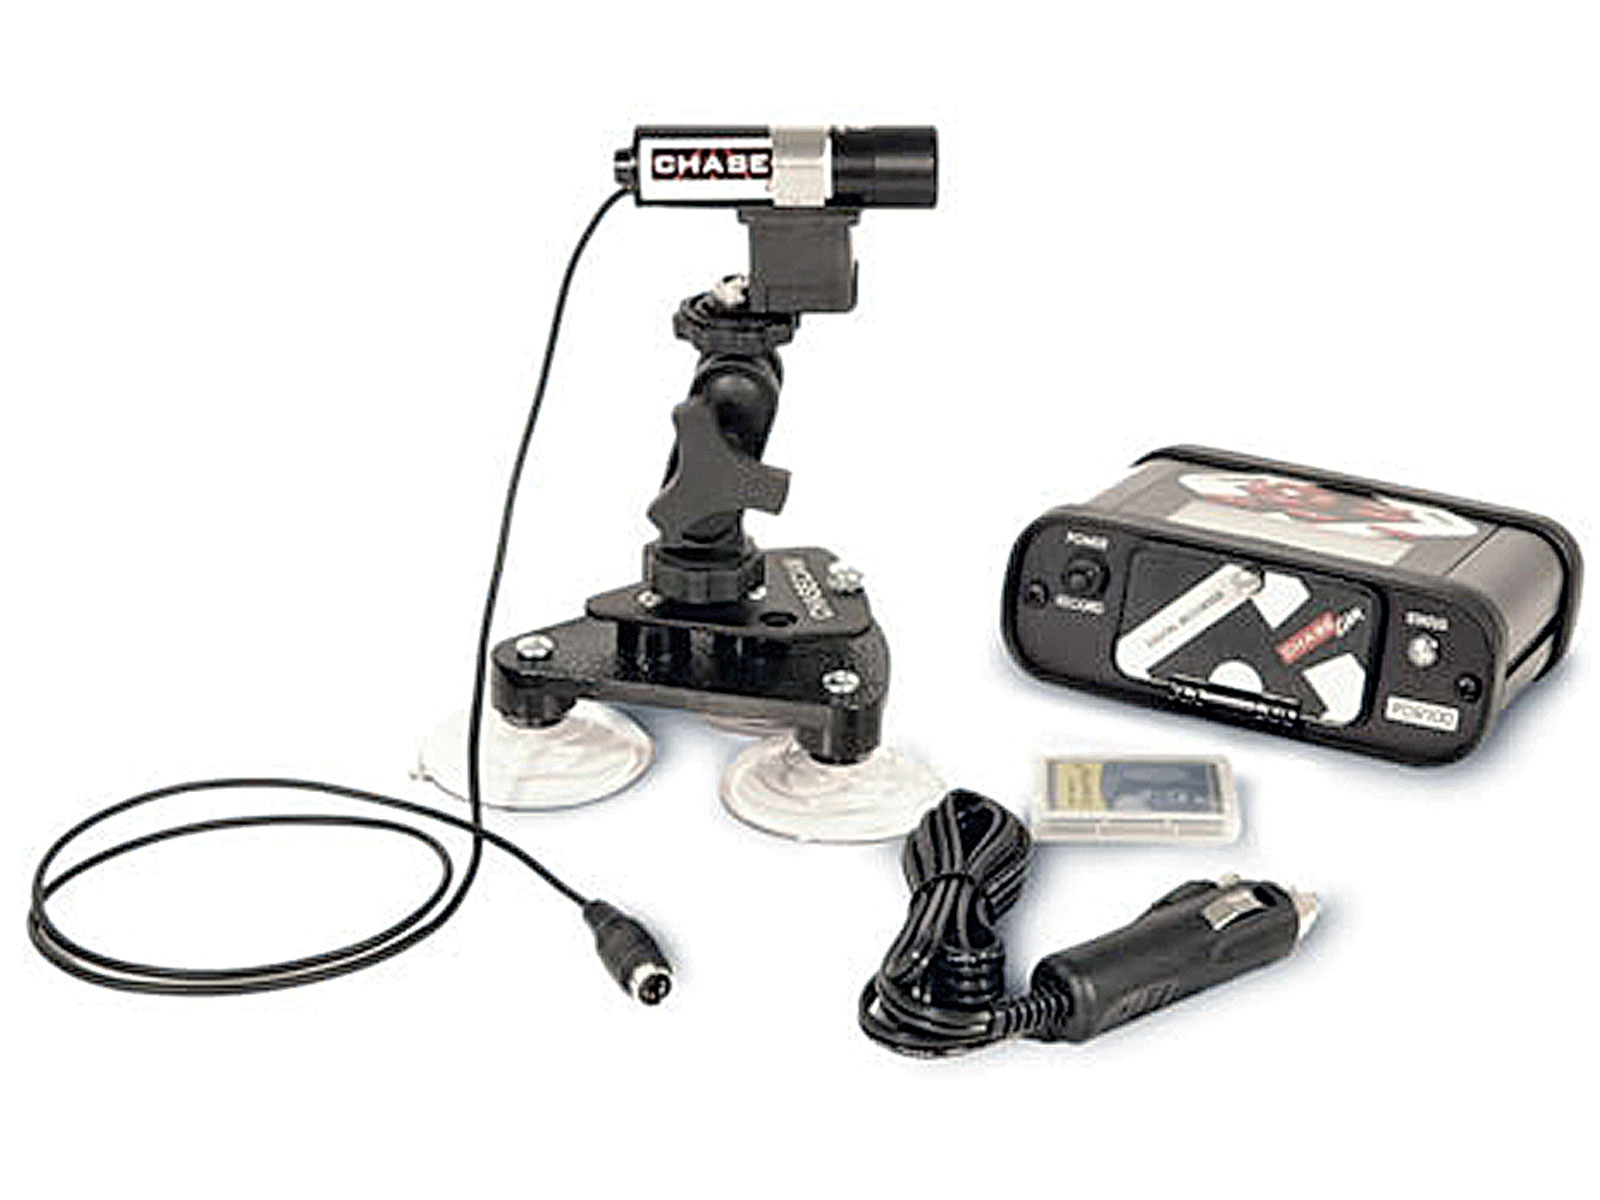 In Car Video Cameras